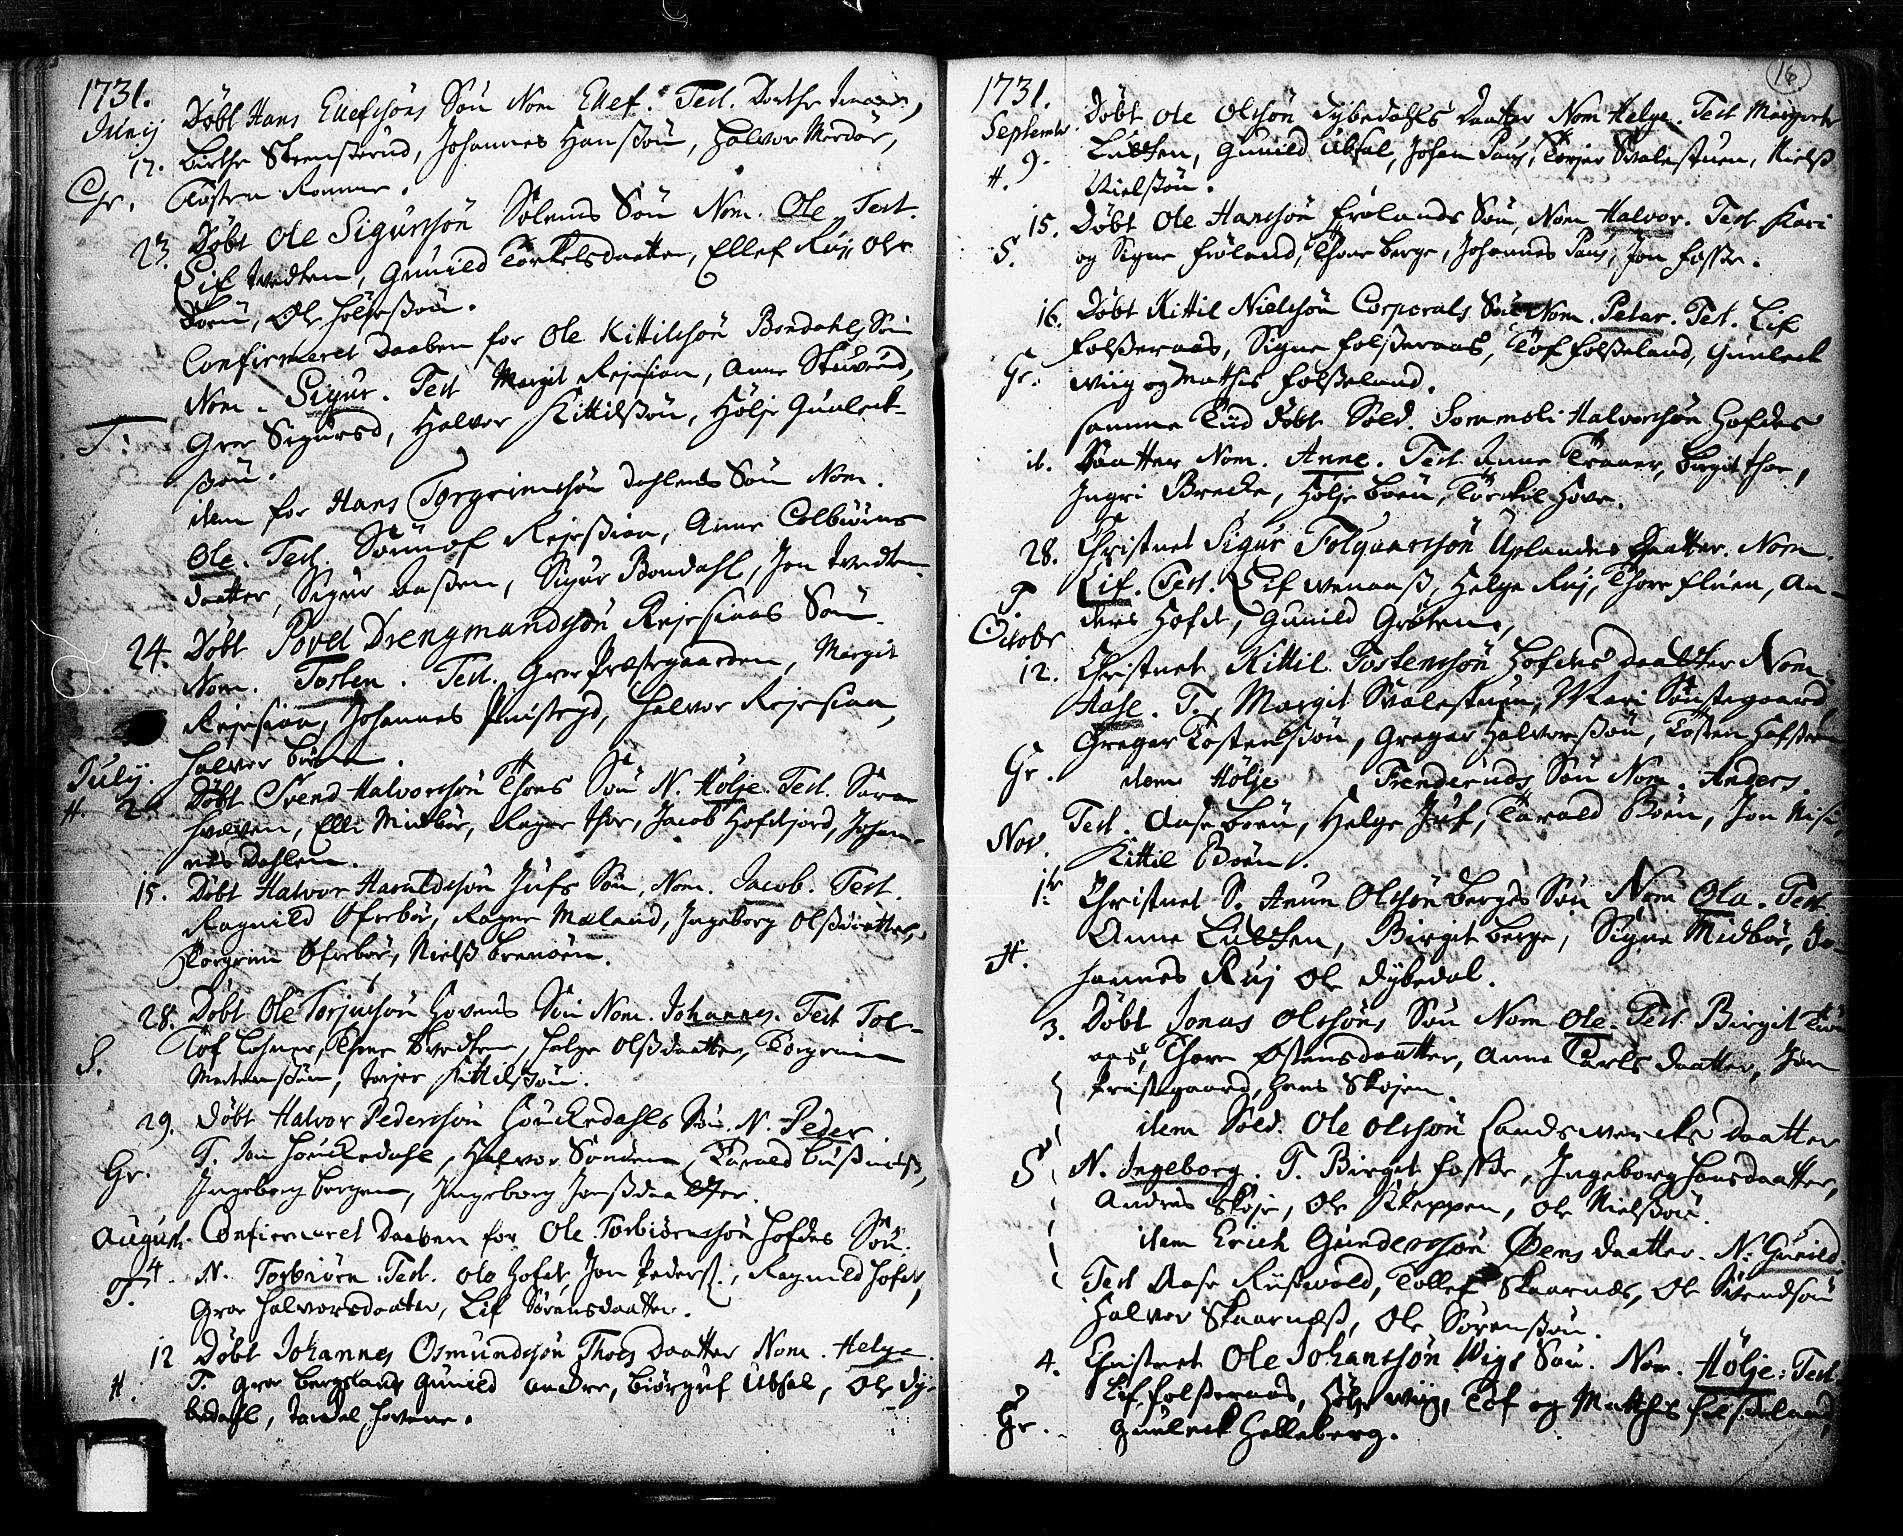 SAKO, Hjartdal kirkebøker, F/Fa/L0003: Ministerialbok nr. I 3, 1727-1775, s. 16